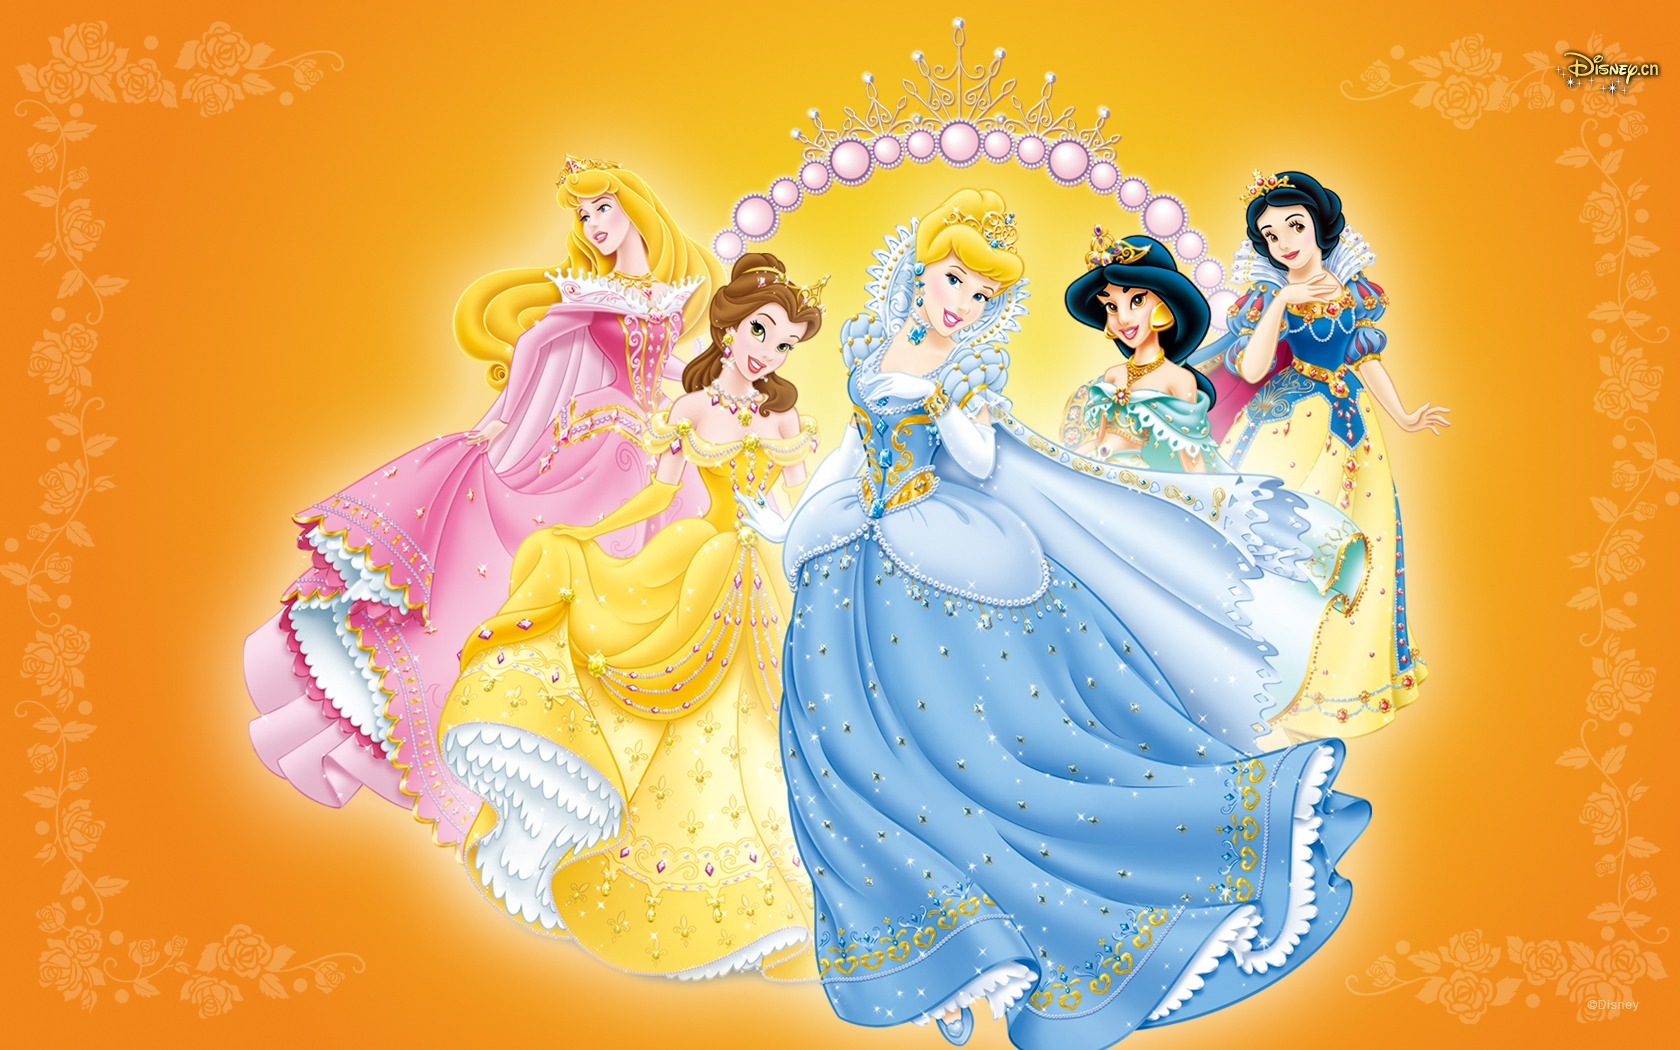 Disney Princess   Disney Princess Wallpaper 33693782 1680x1050